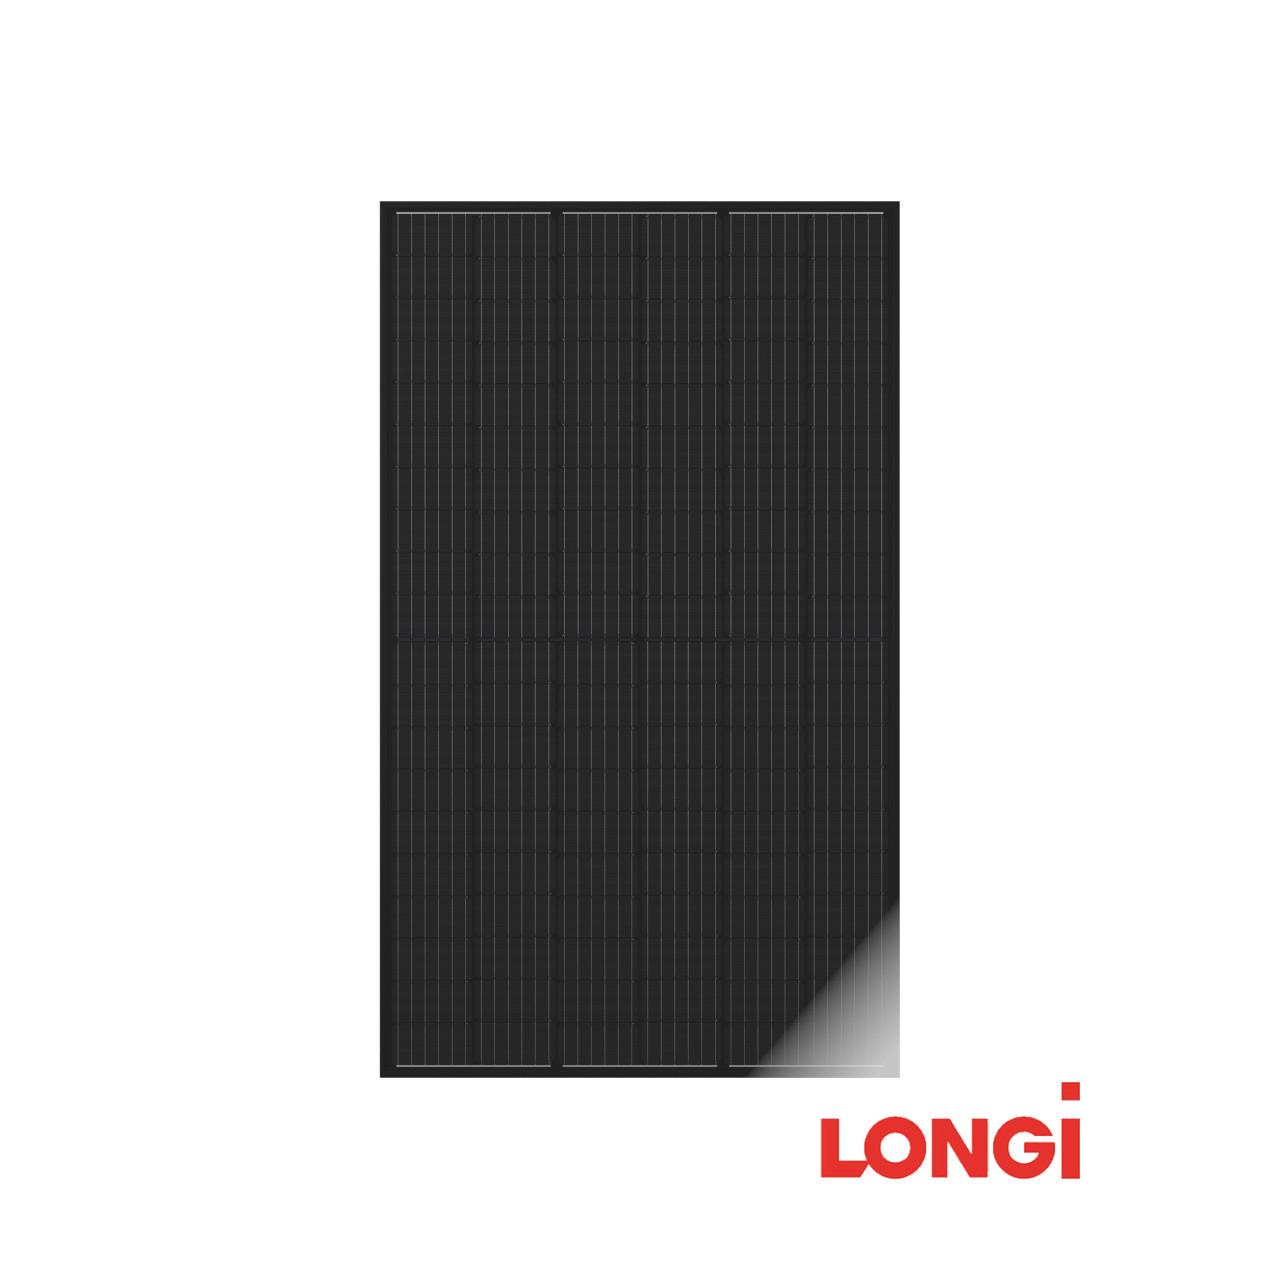 Longi - LR4-60HPB-360M - Mono - Black